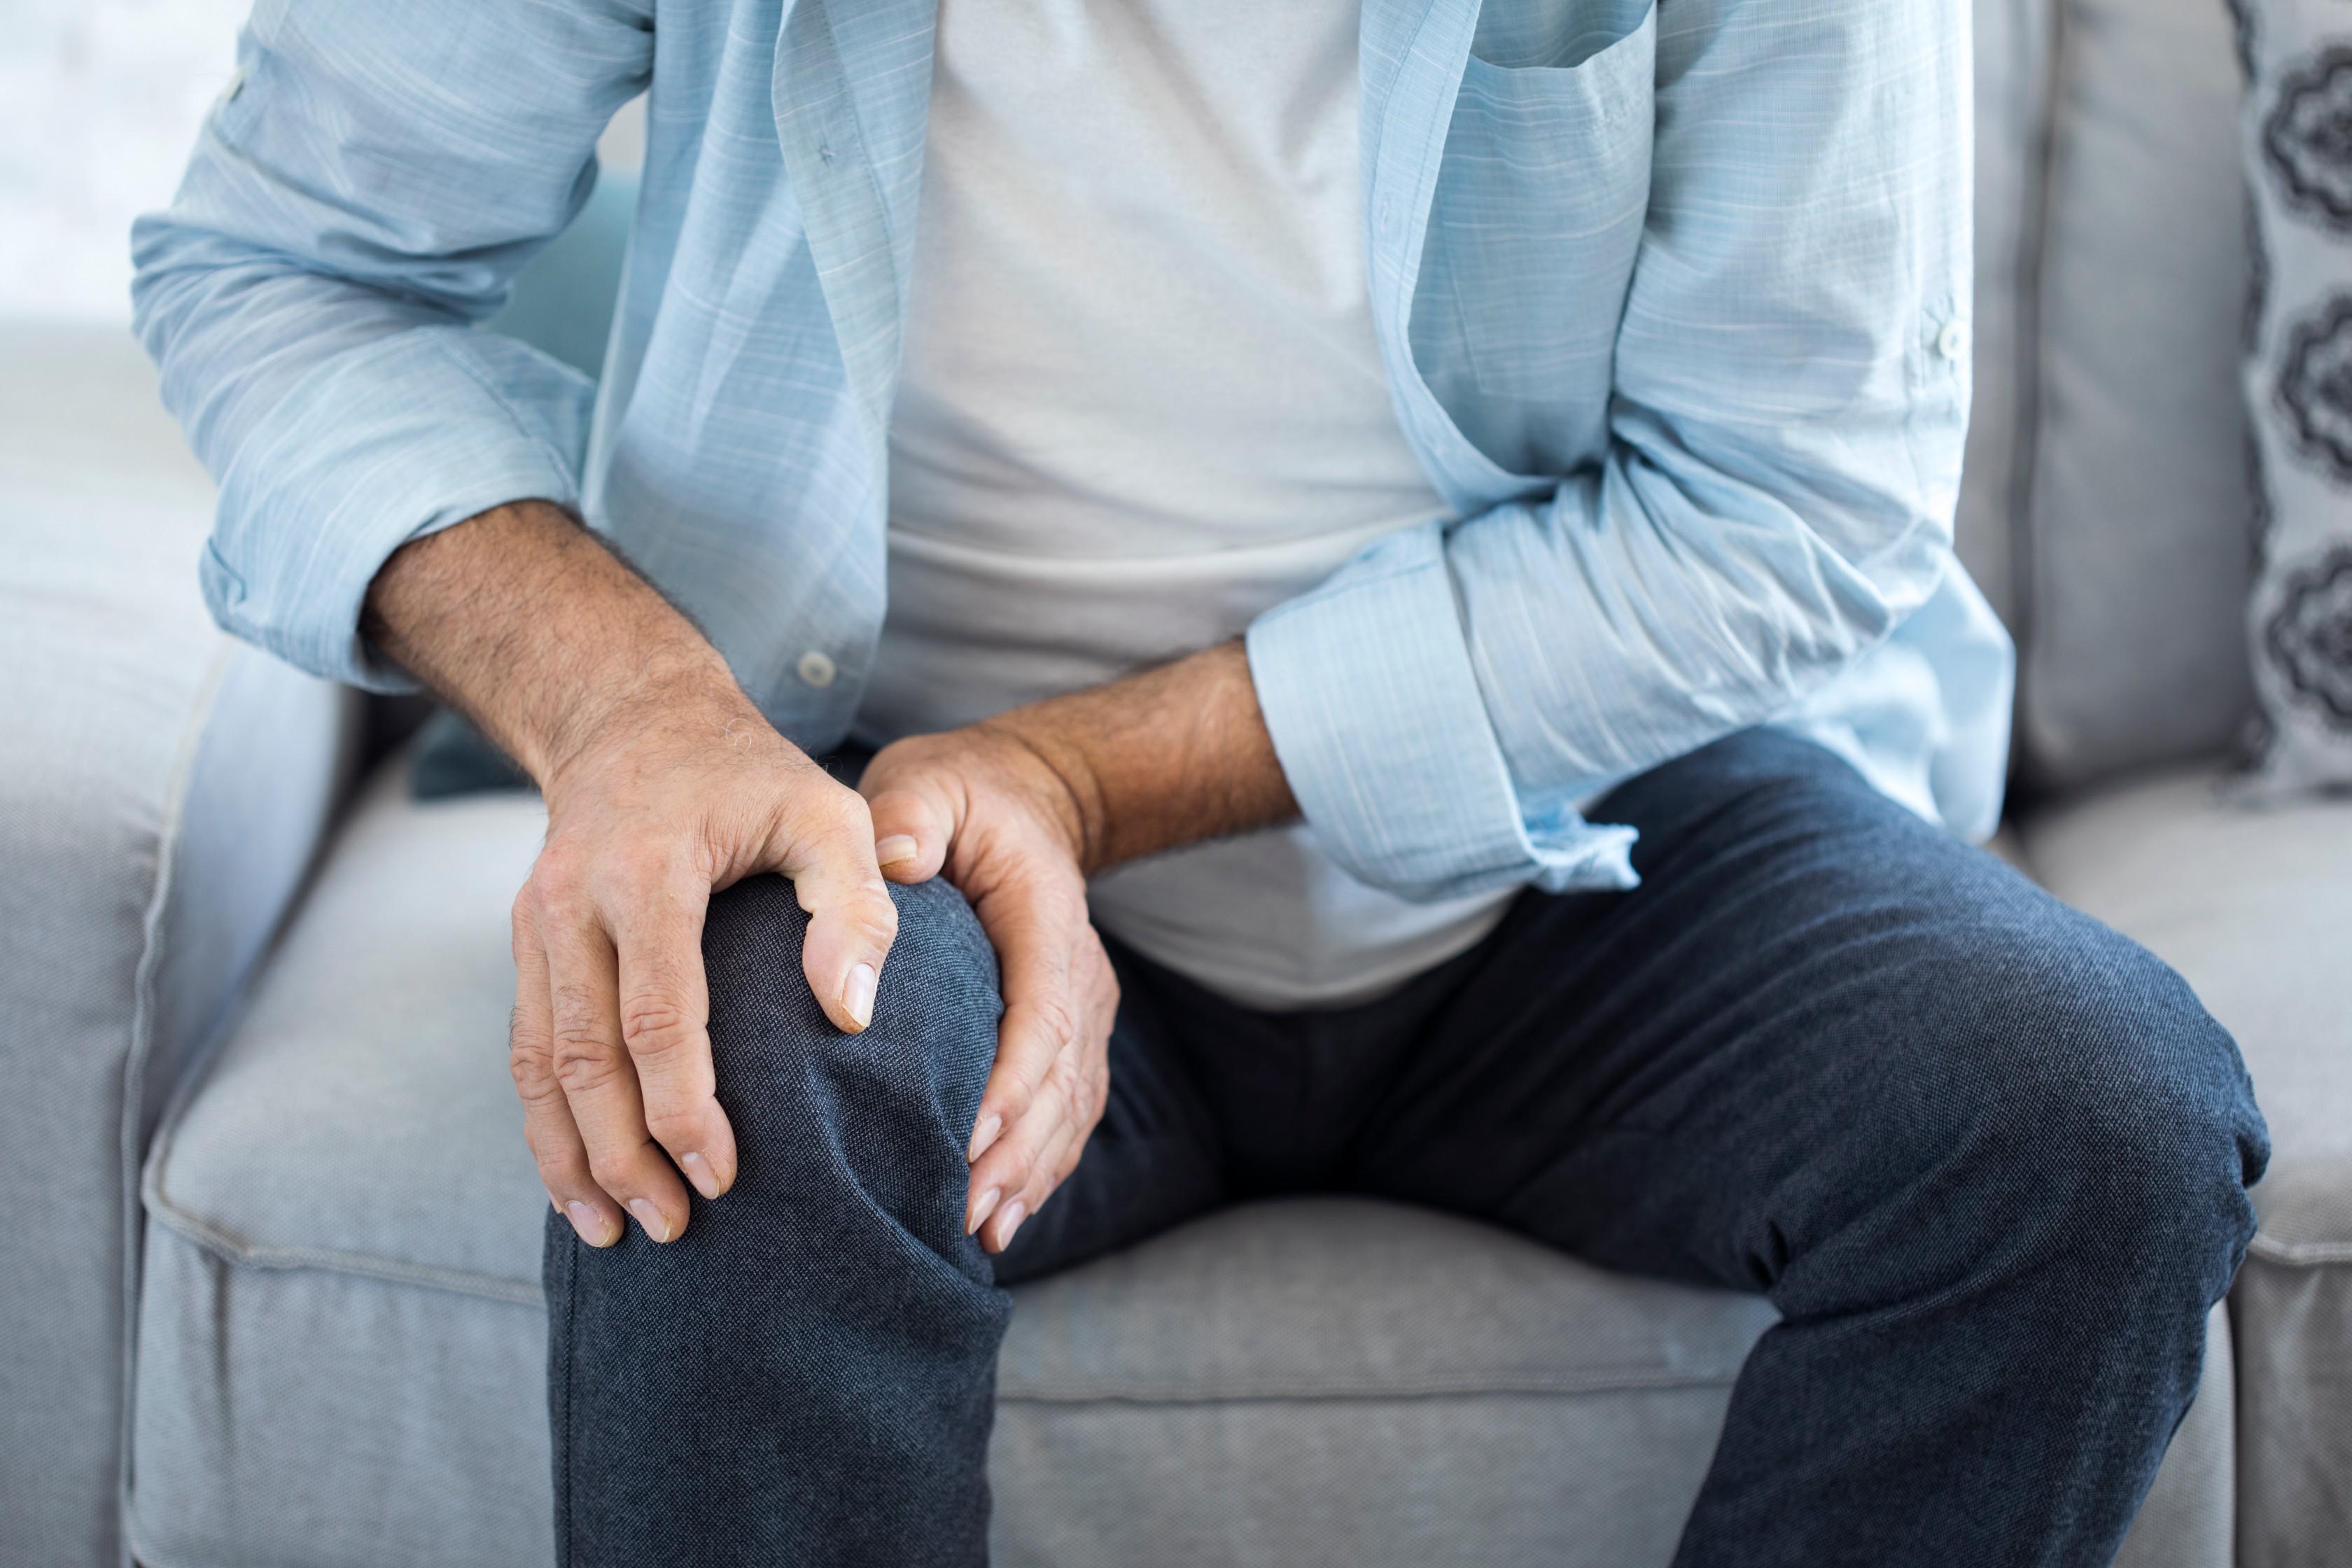 izomfájdalom tünetei ízület